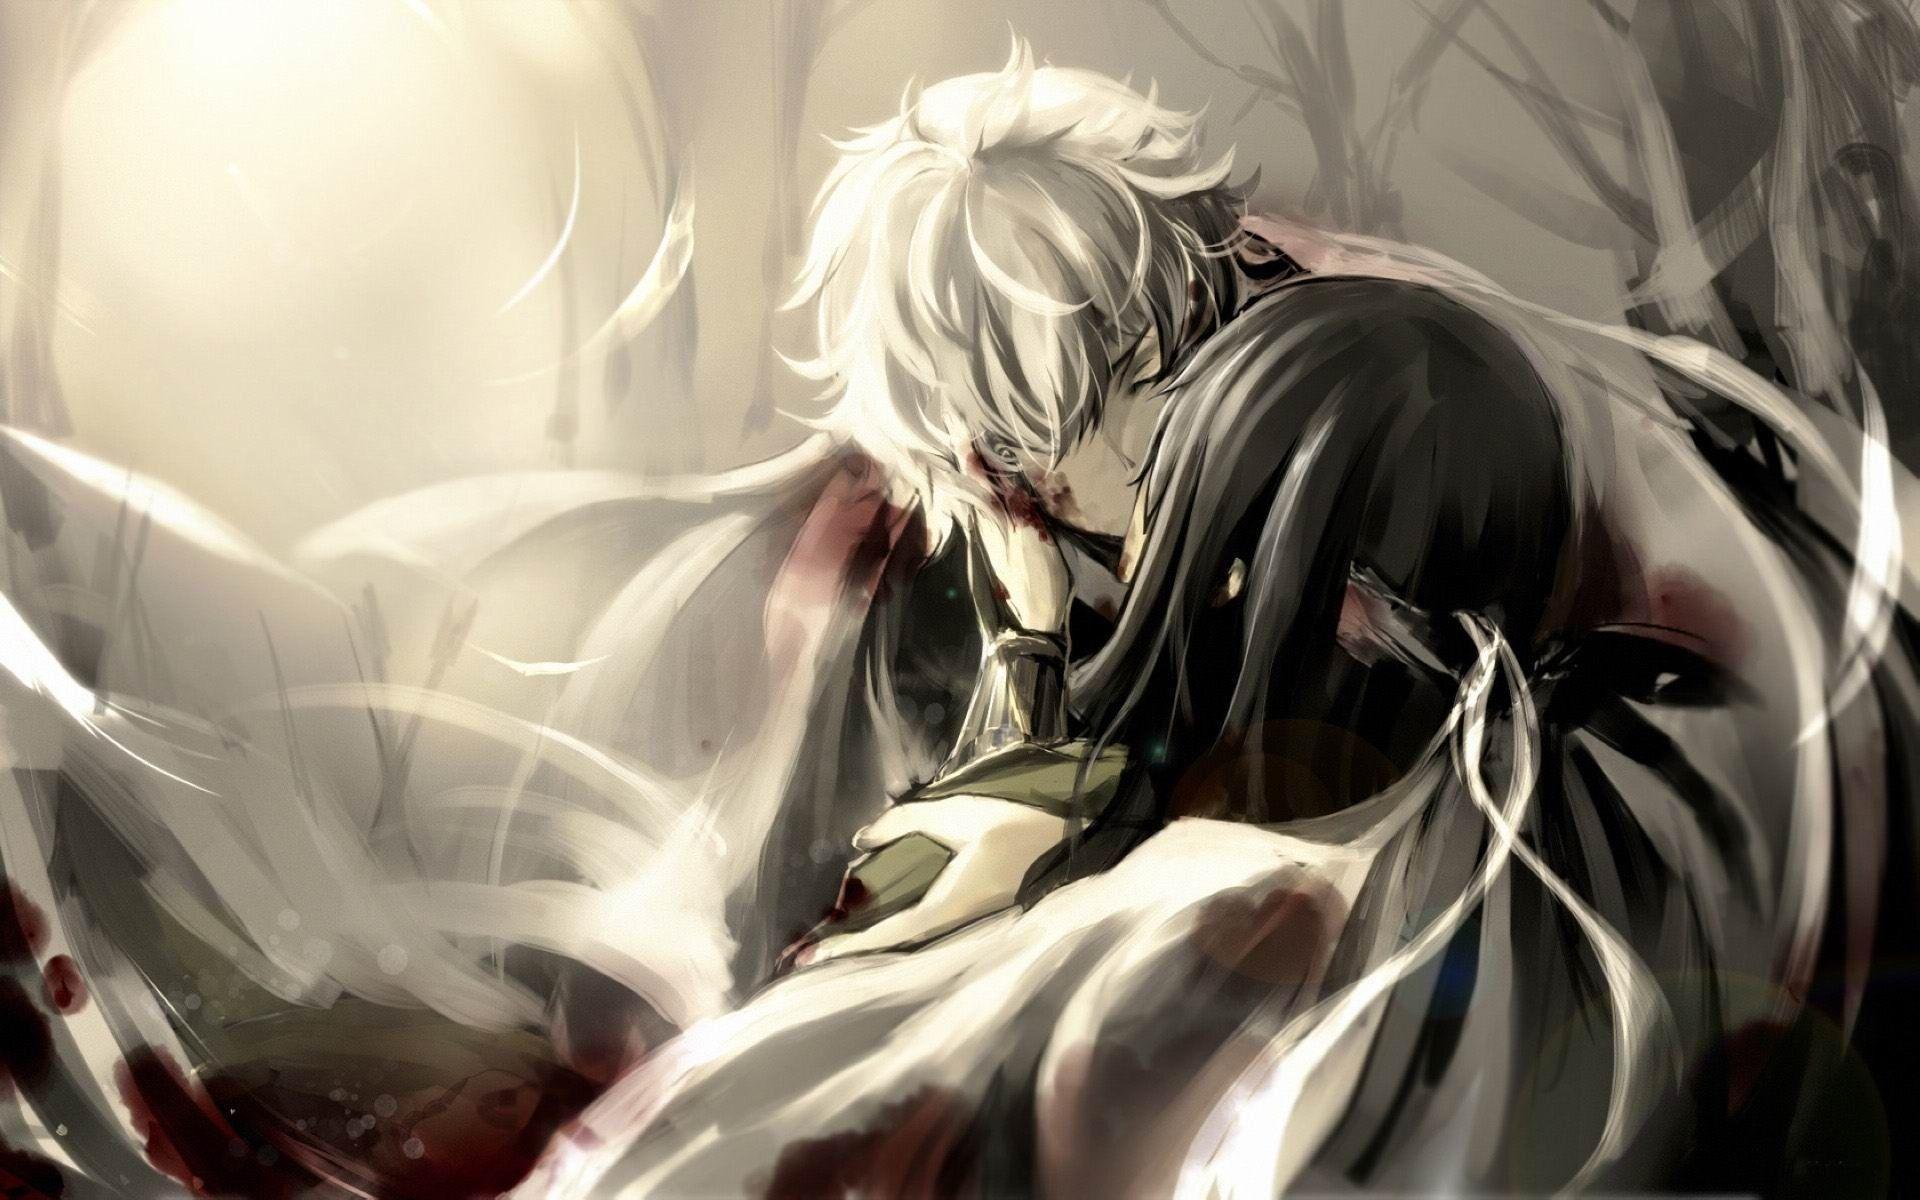 Res: 1920x1200, Cute Anime Couple Hugging HD Wallpaper - Beraplan.com